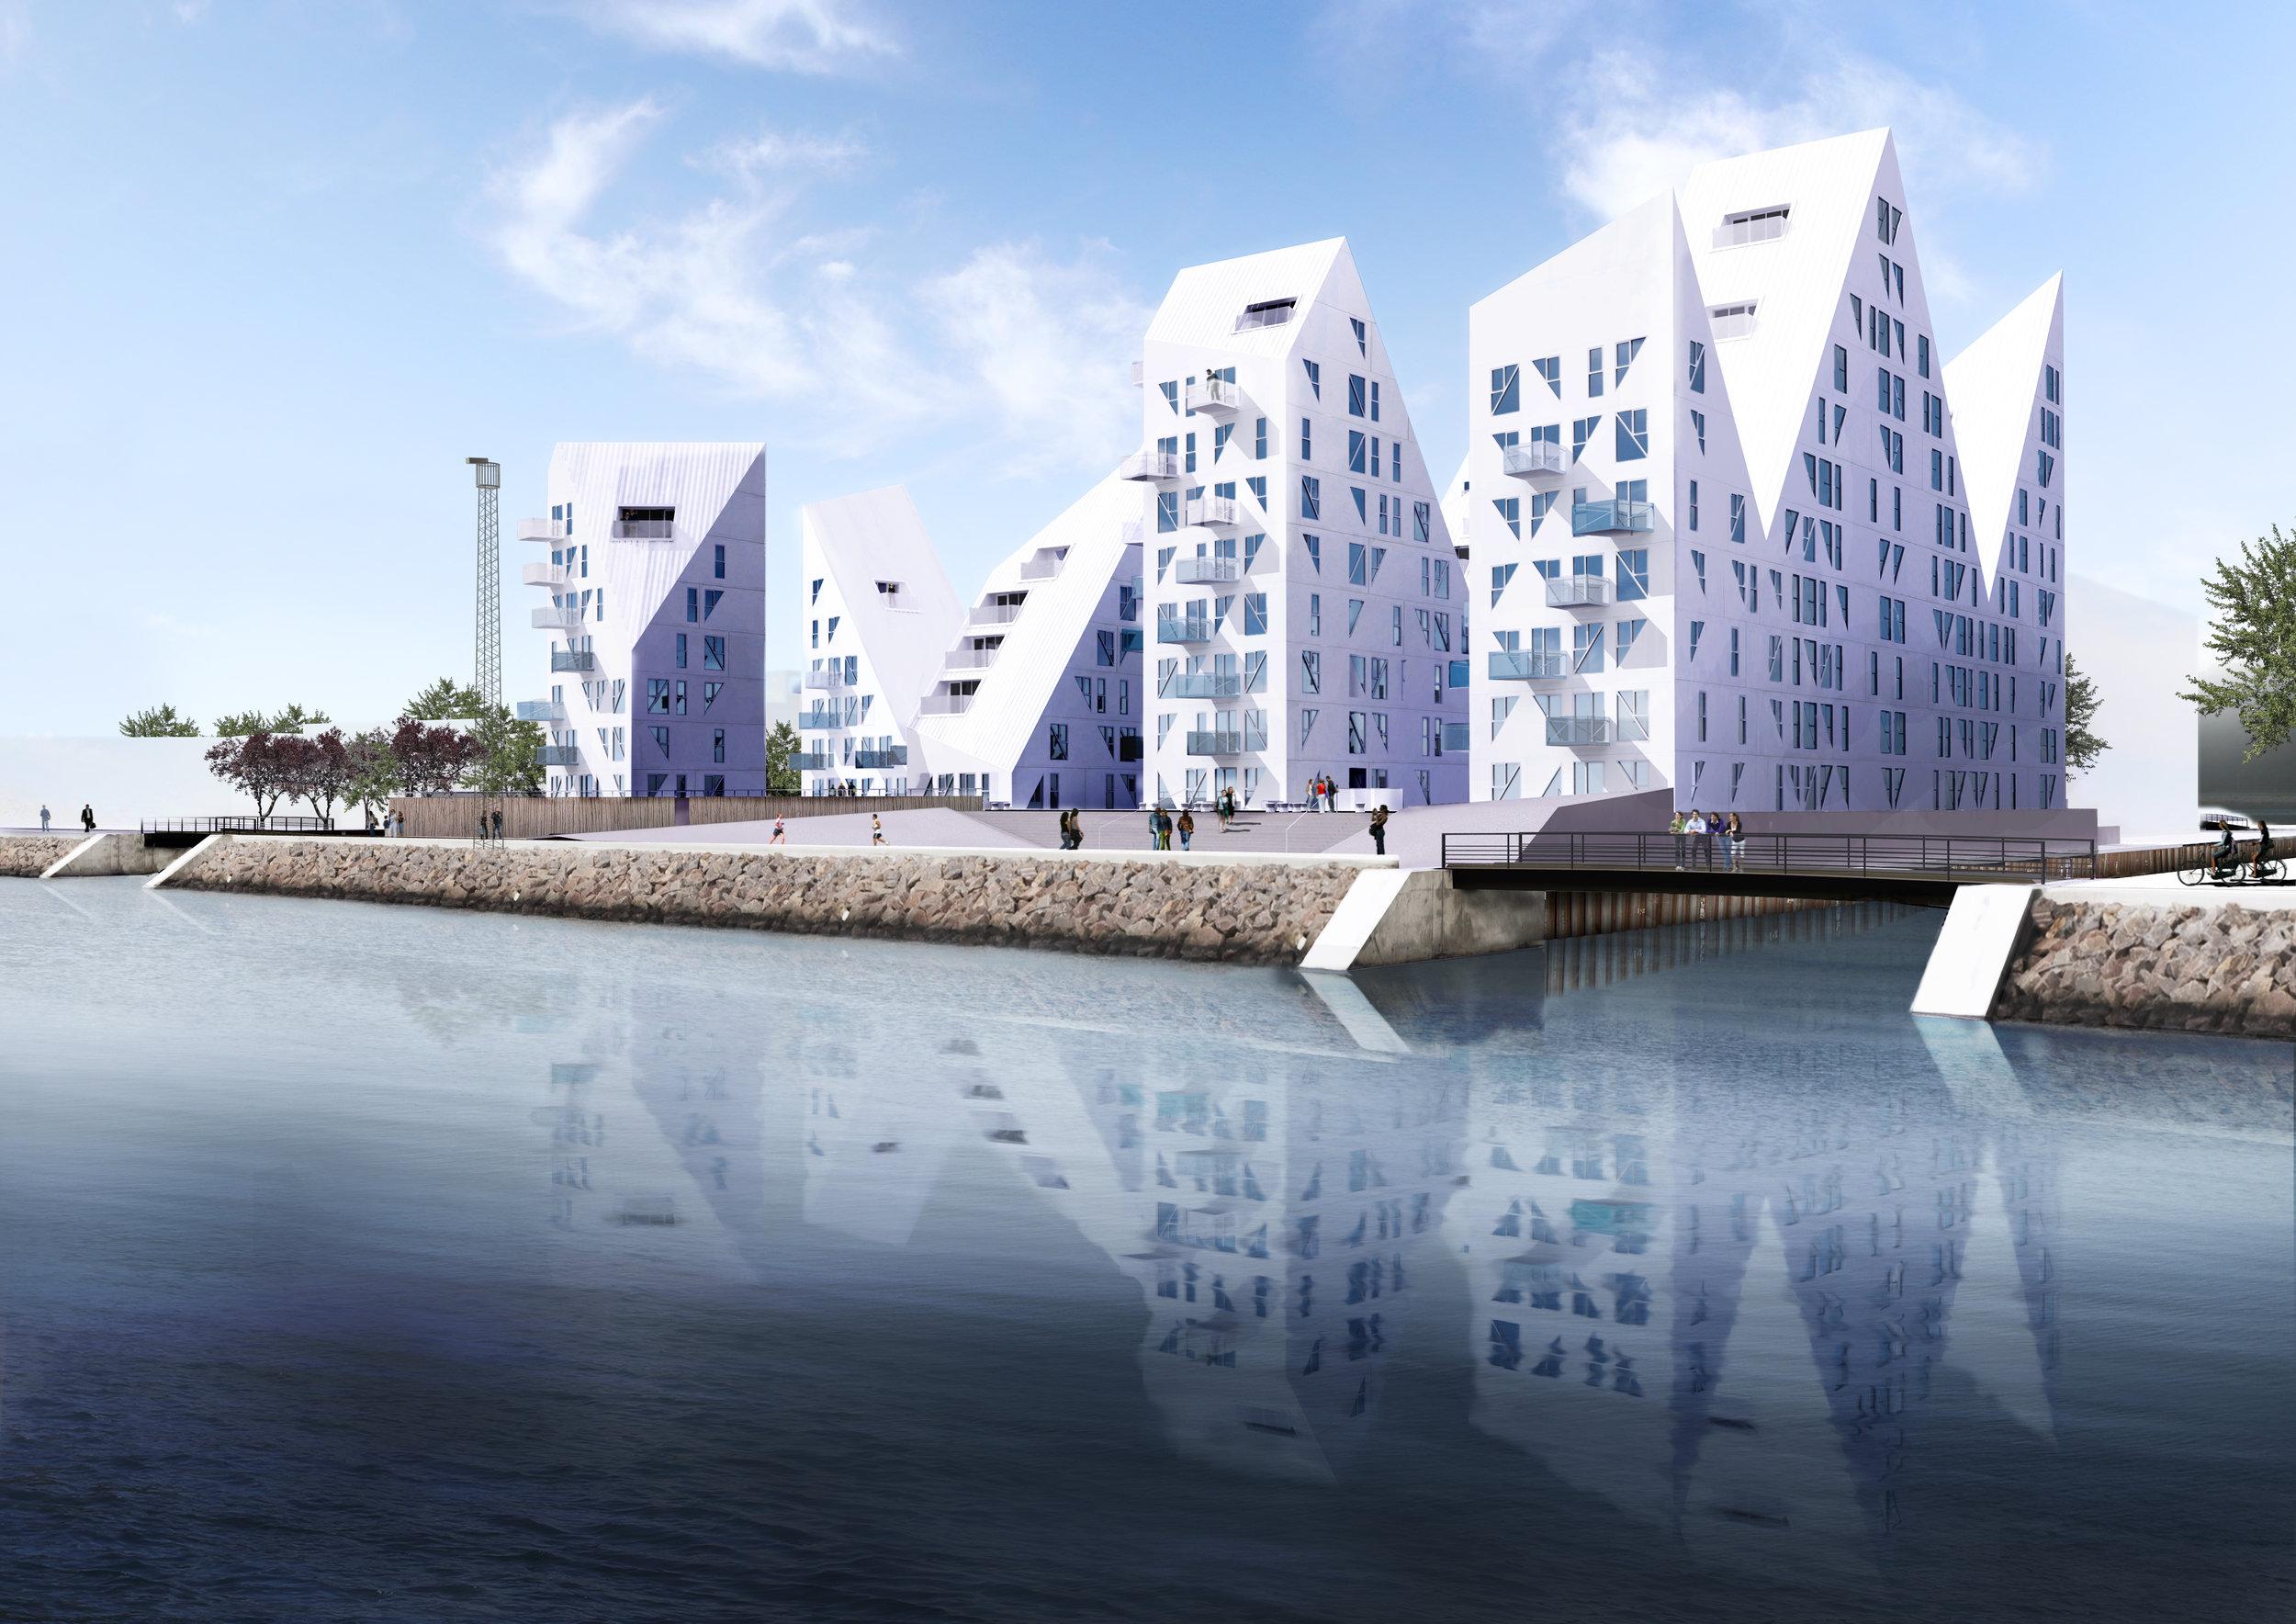 Isbjerget   28.400 m2   2011-2013   400 mio. kr.    Hovedentreprenør: NCC Construction Danmark A/S